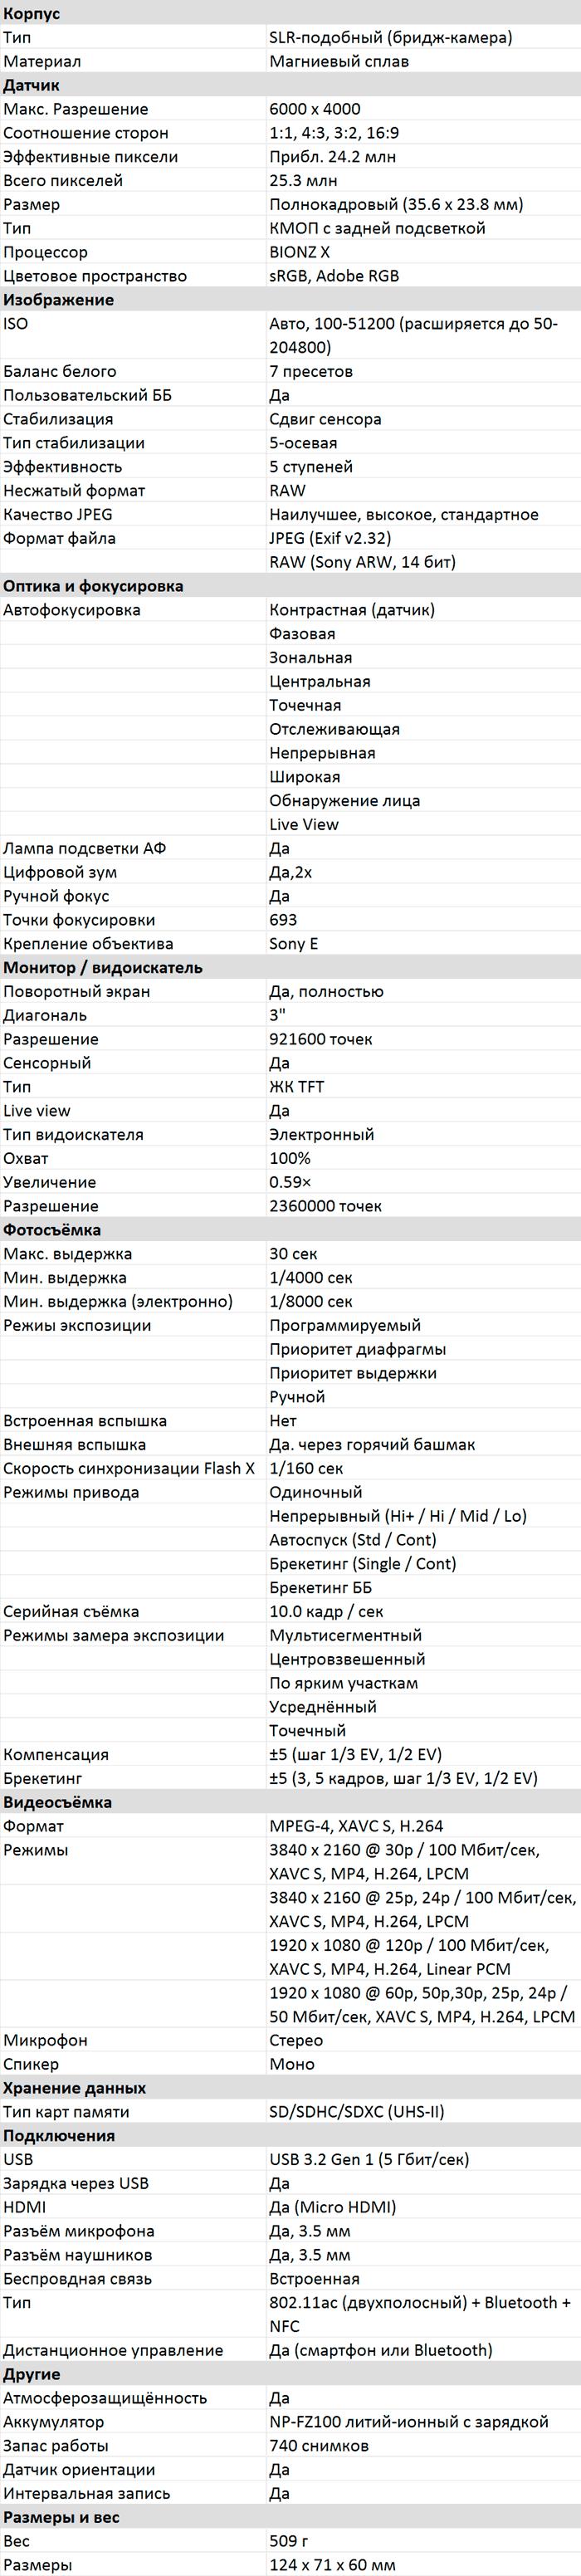 Характеристики A7C